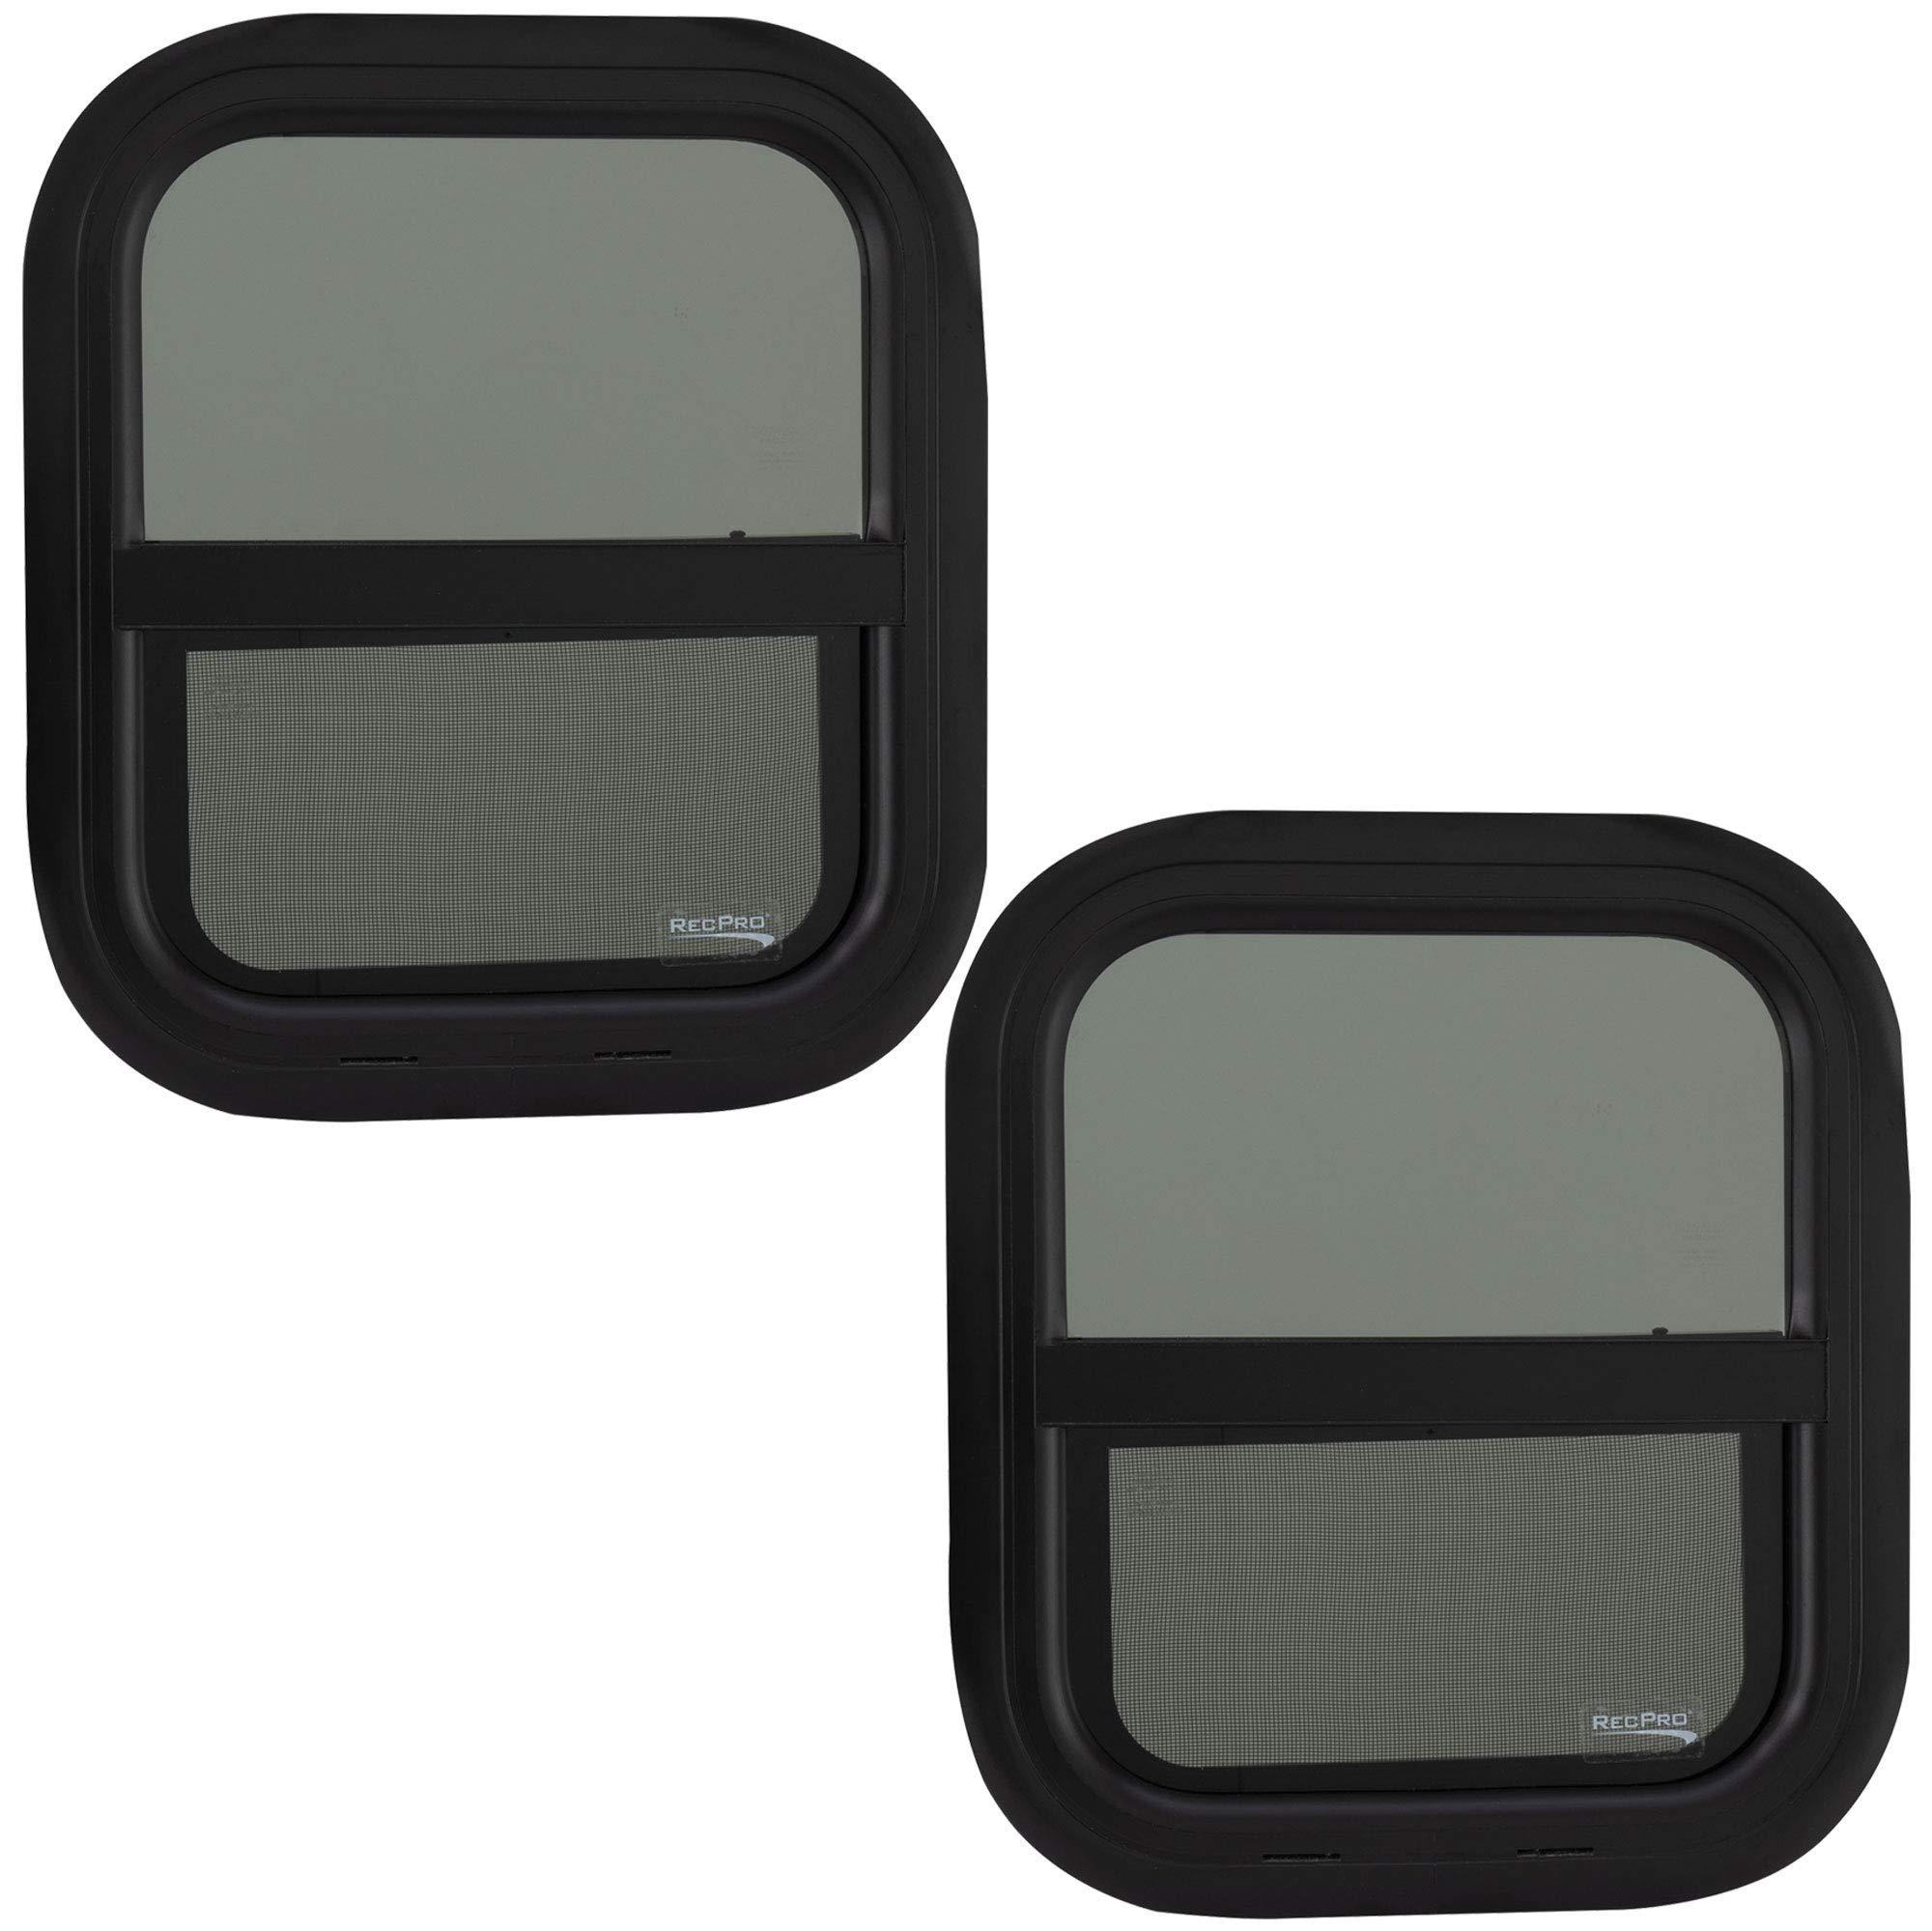 "RV Window | Teardrop 14"" W x 16"" H Vertical Slide | 1 1/2 Wall Thickness | RV Window Replacement (2 Windows, with Trim Kit)"